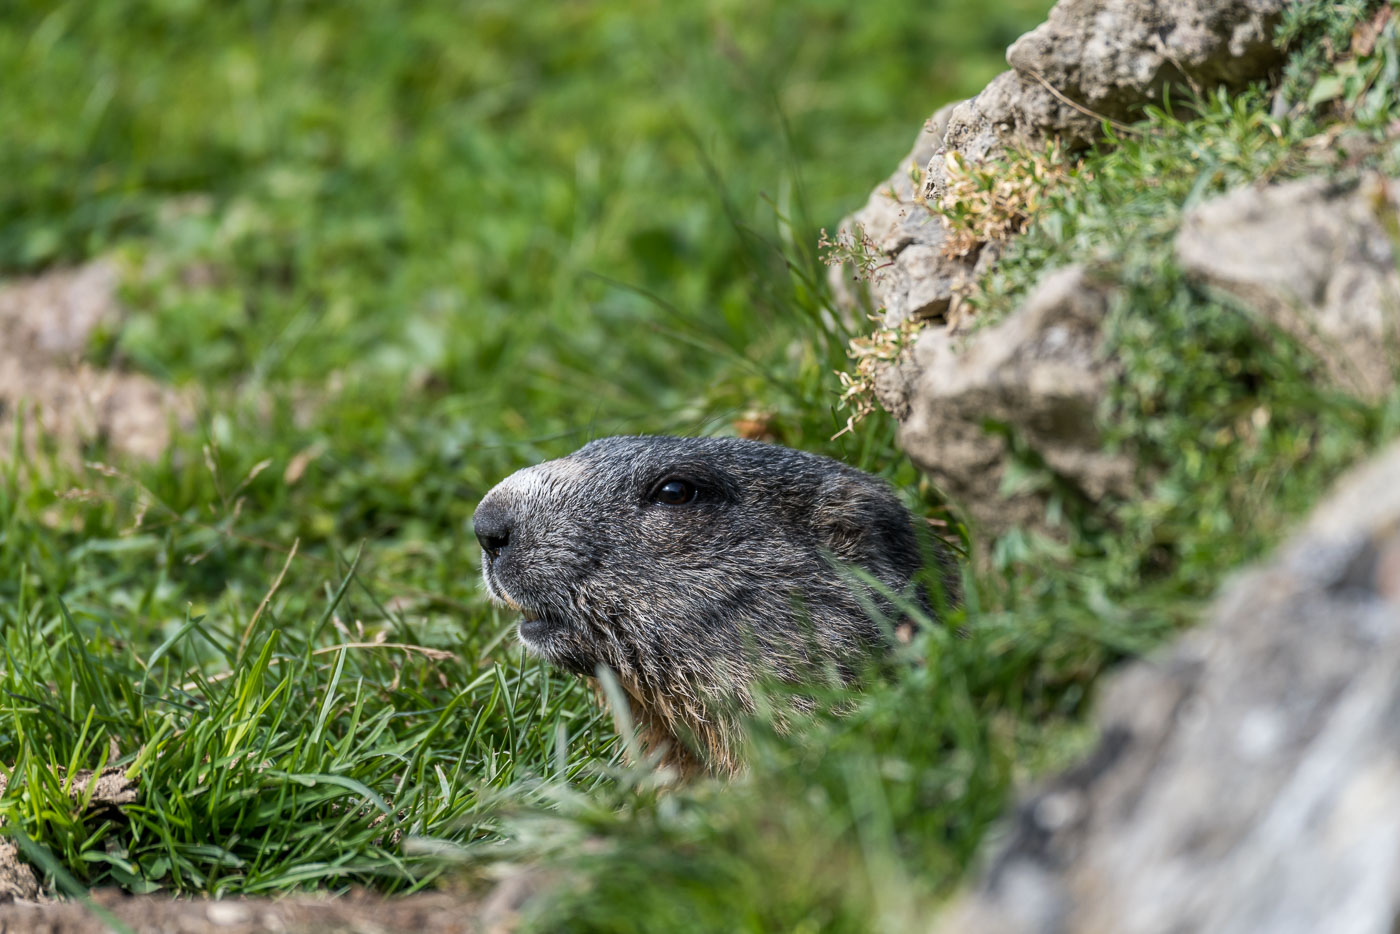 Neugieriges Murmeltiere [Marmota]